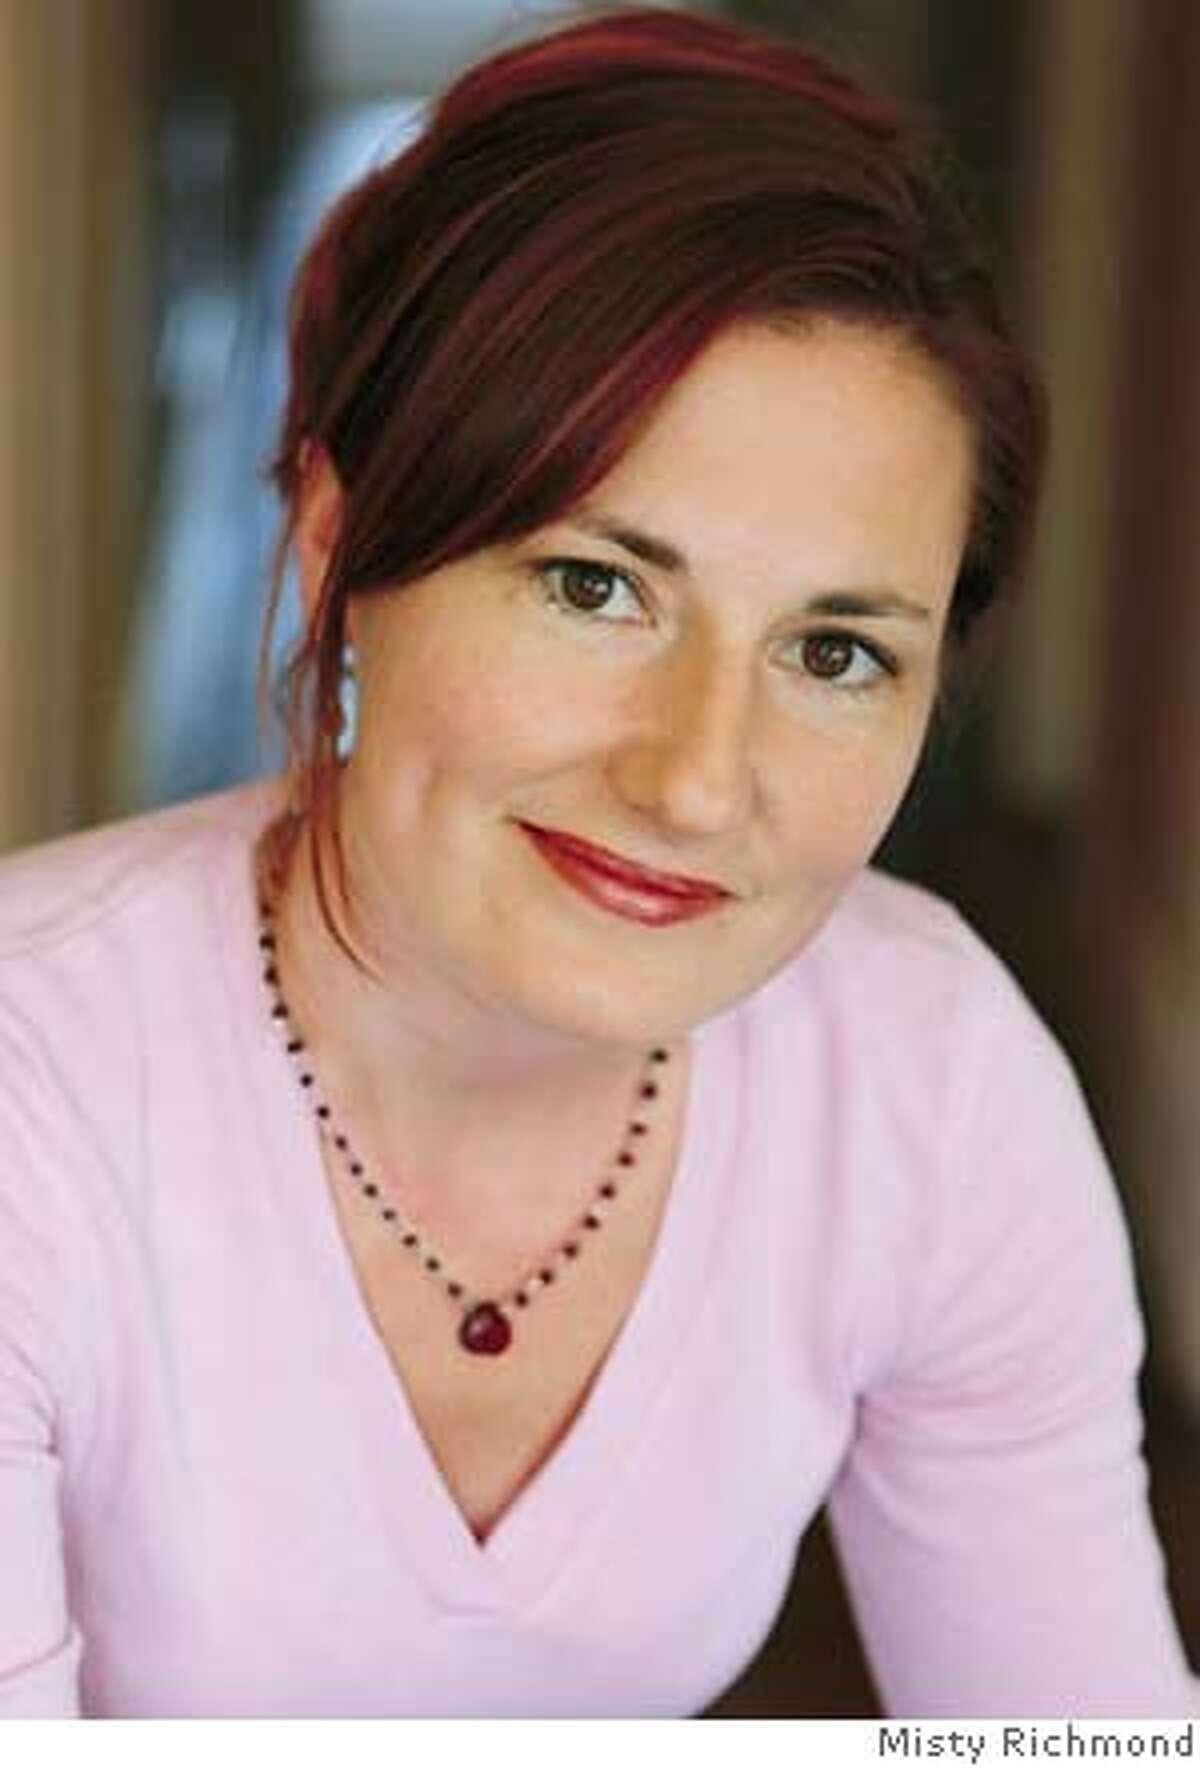 Michelle Richmond, author of